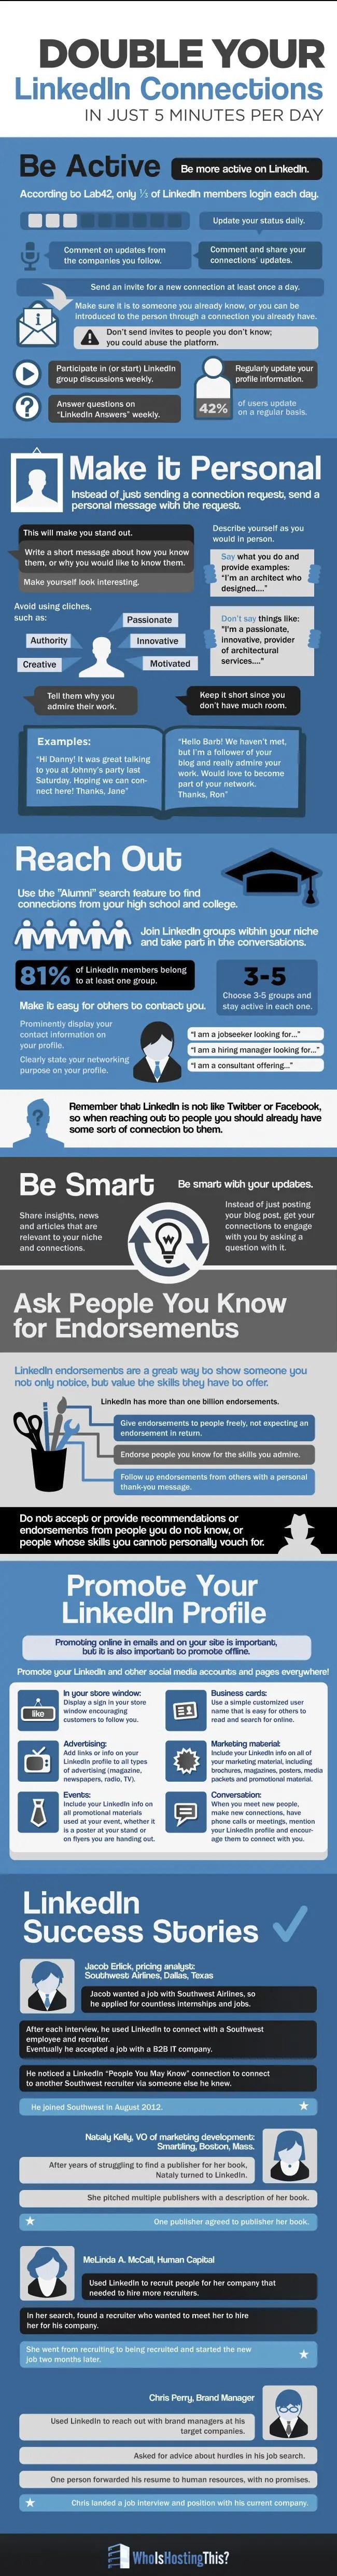 wersm_linkedin_infographic